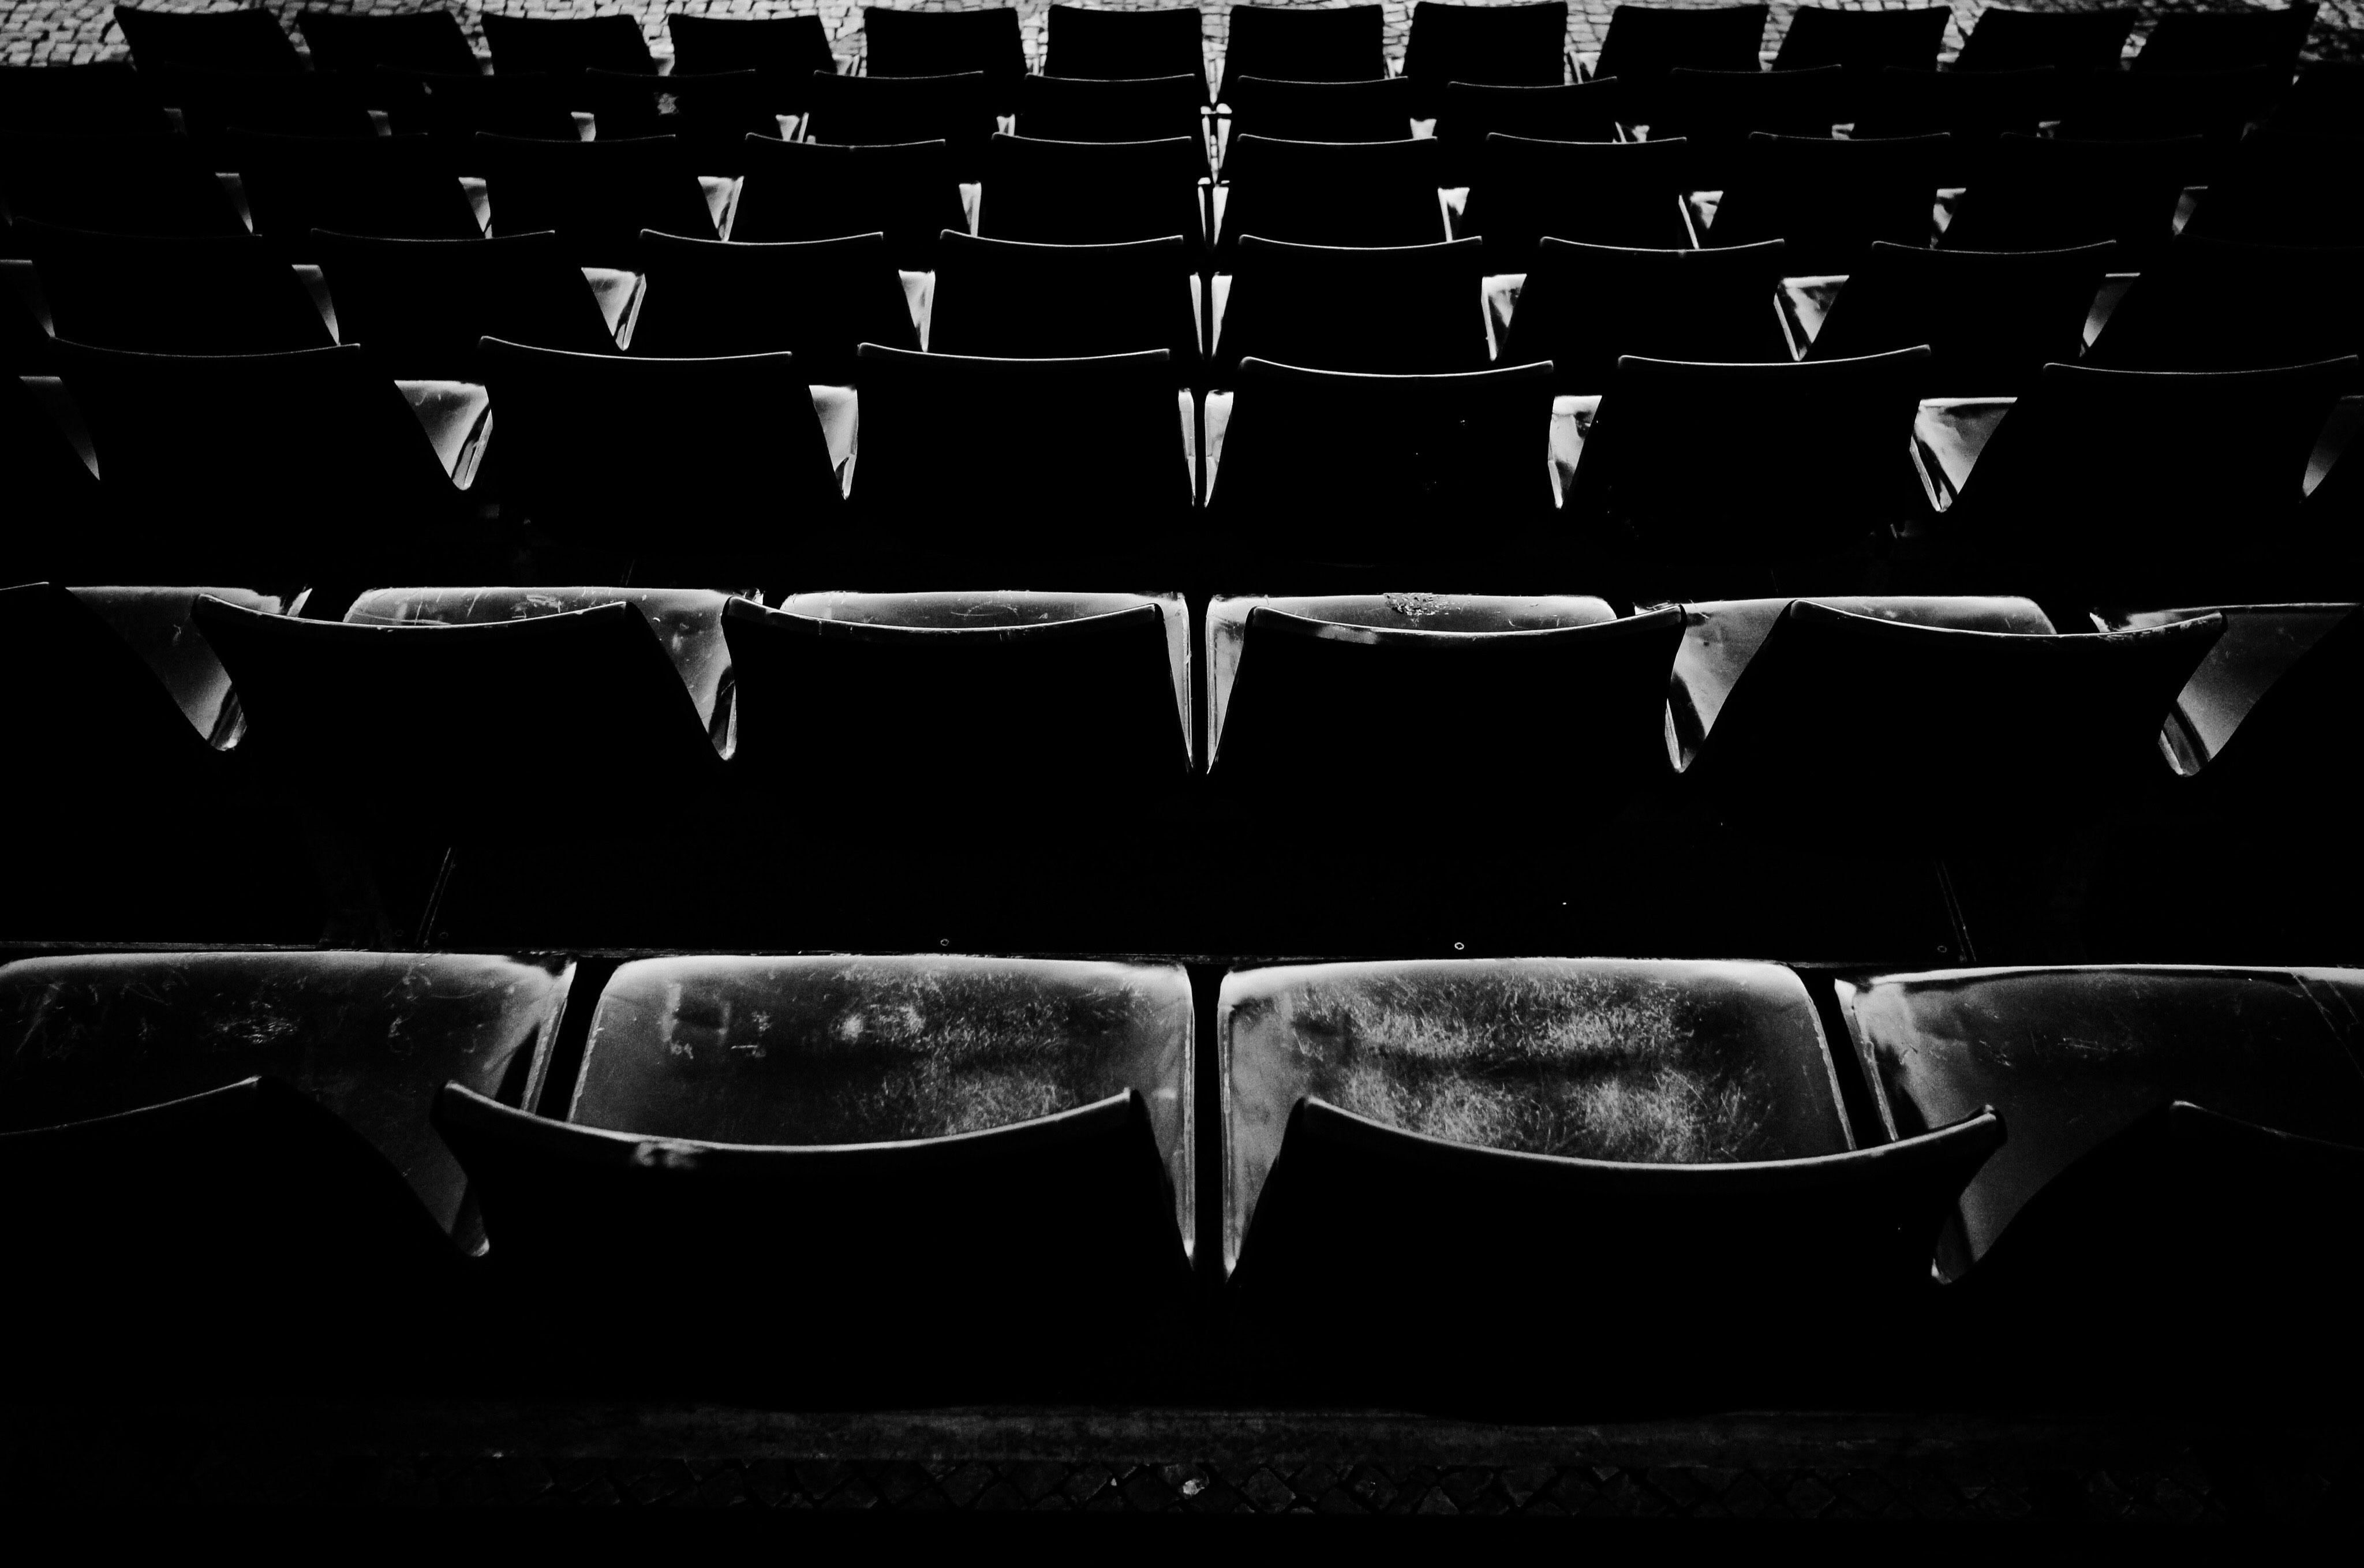 empty_seats_faro_5112